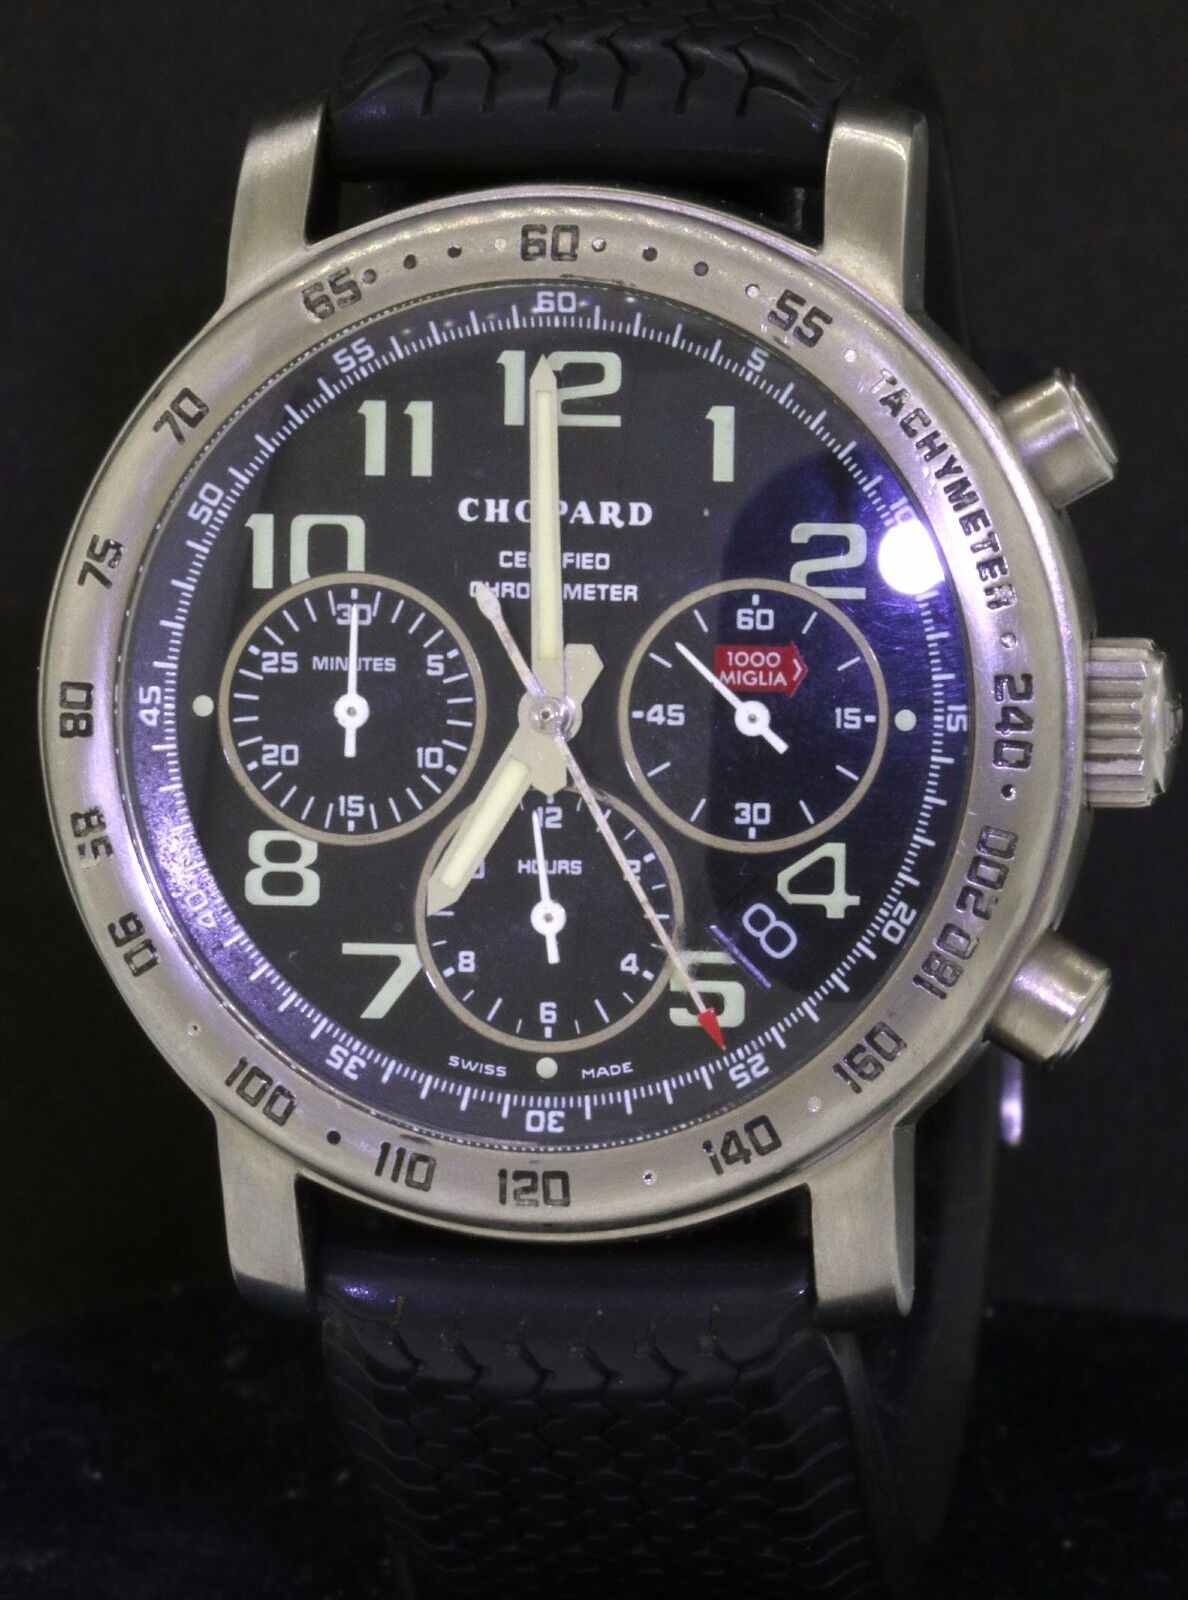 Chopard 1000 Miglia 8915 Titanium automatic chronograph men's watch - watch picture 1